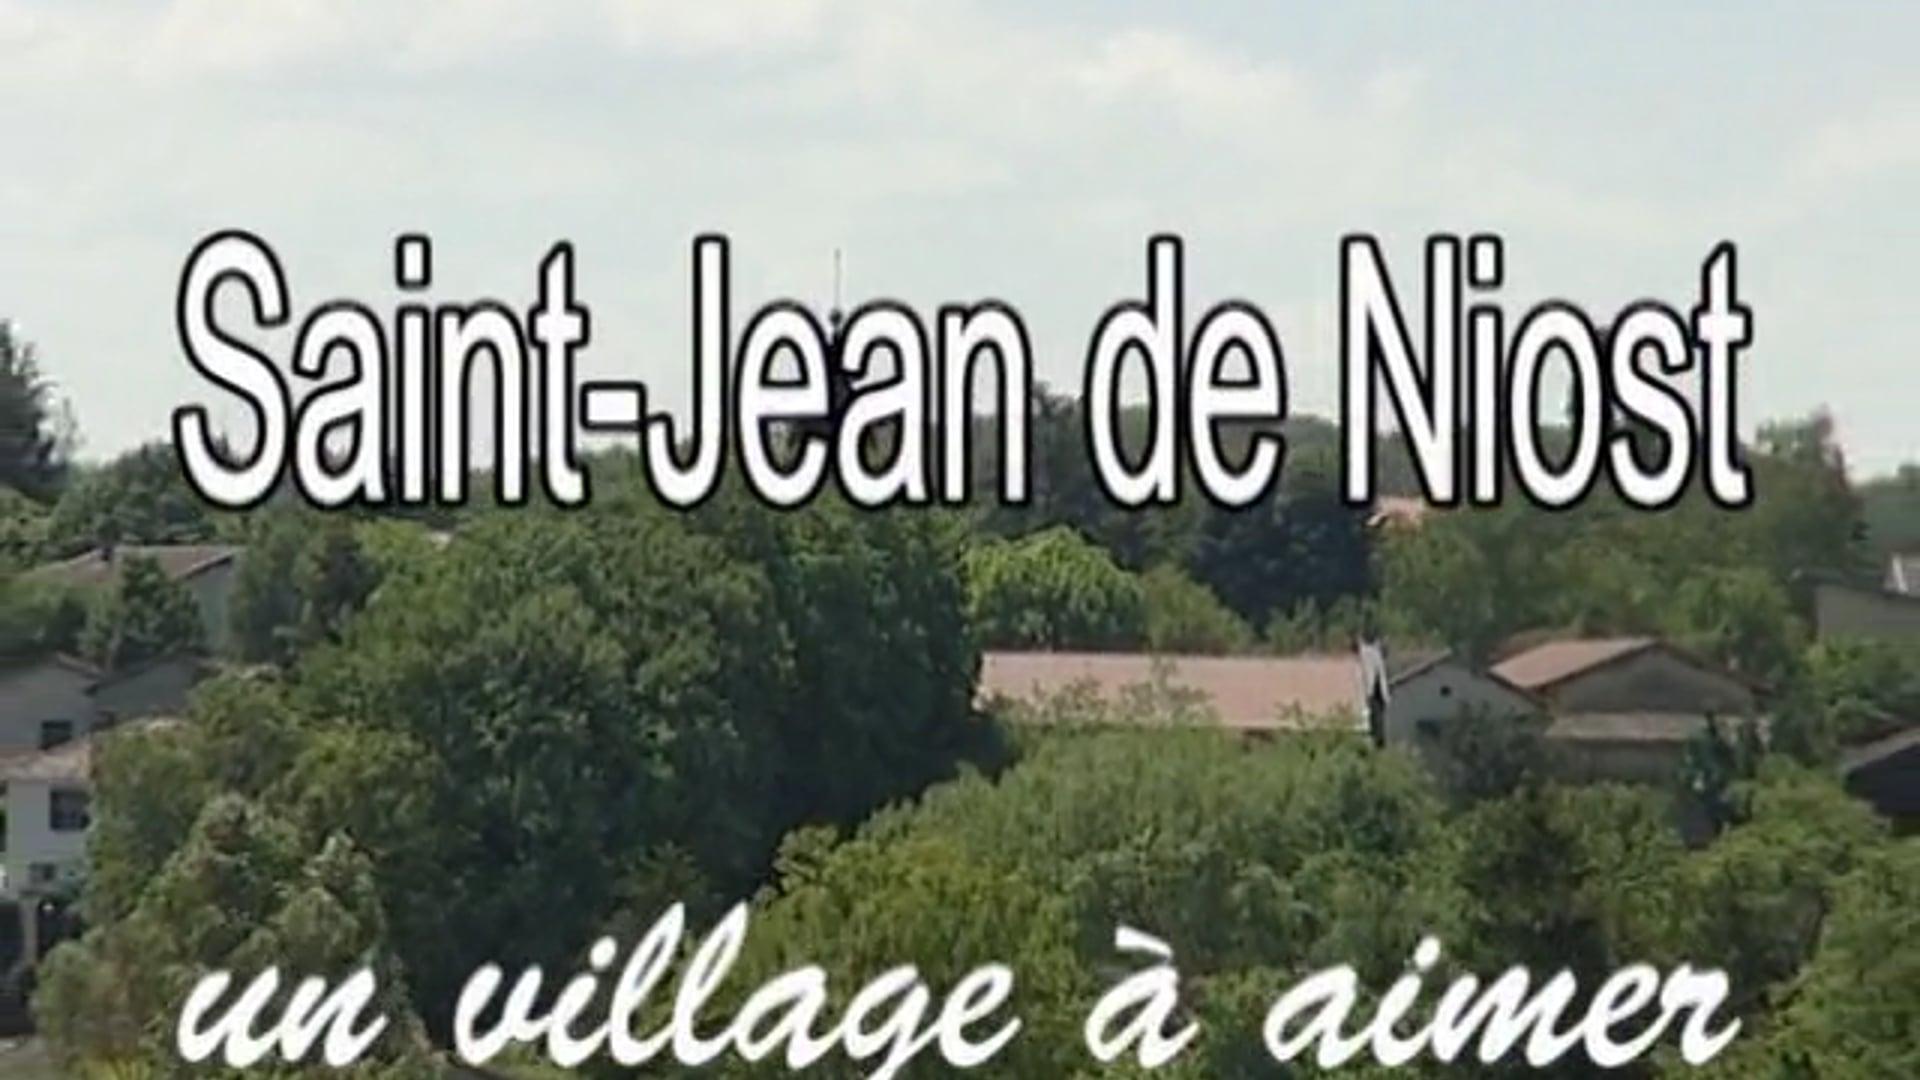 SAINT-JEAN DE NIOST UN VILLAGE A AIMER